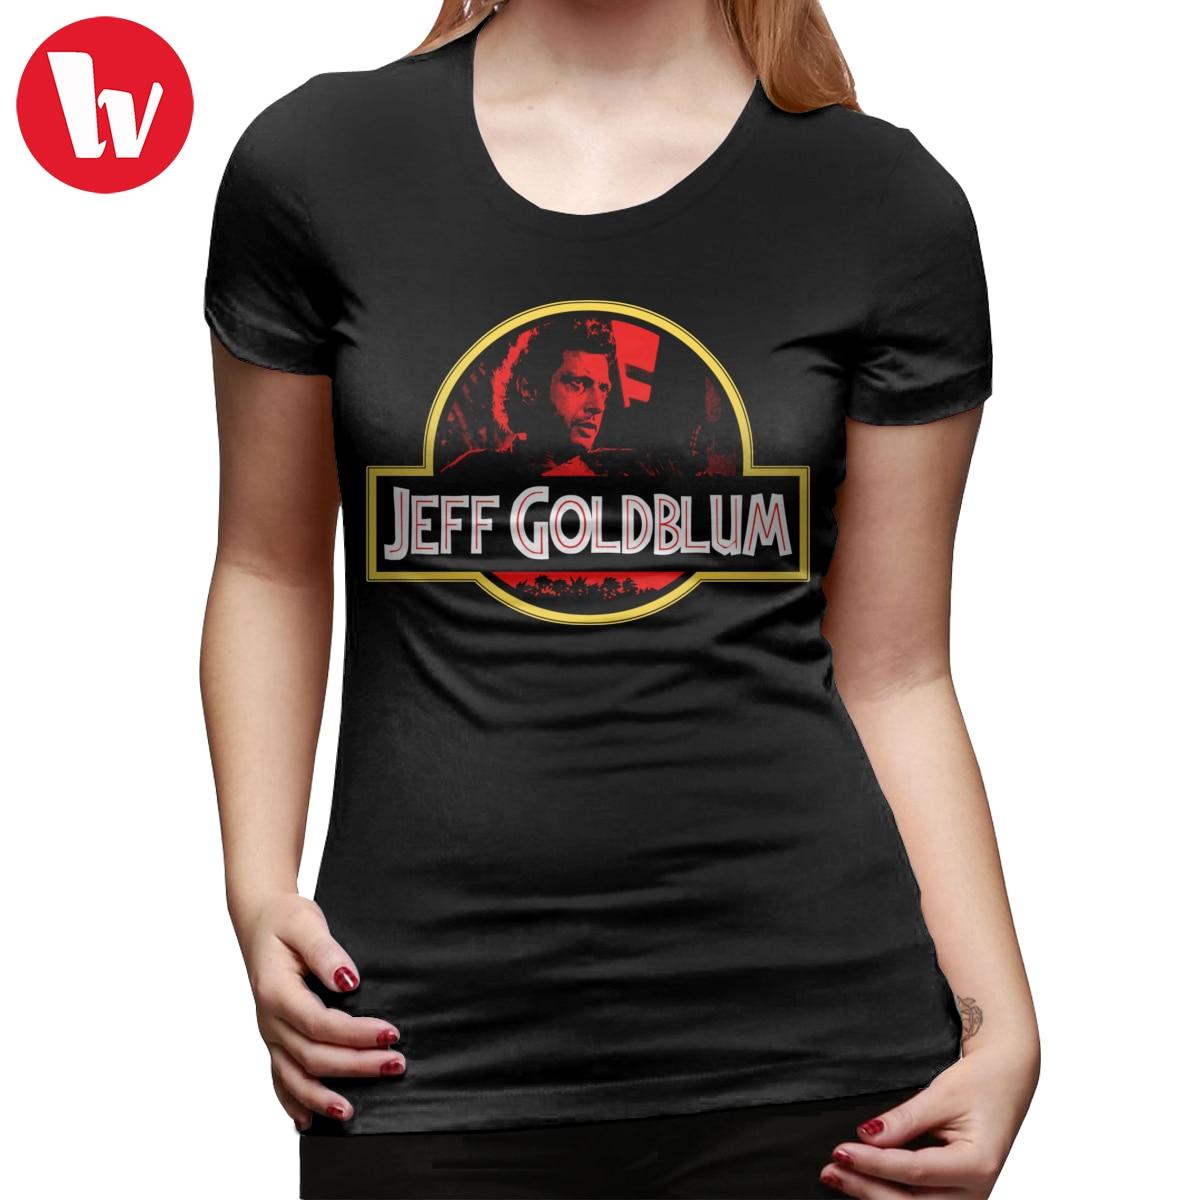 Jeff Goldblum T-Shirt JURASSIC GOLDBLUM T Shirt Printed Navy Women tshirt O Neck Simple Ladies Tee Shirt